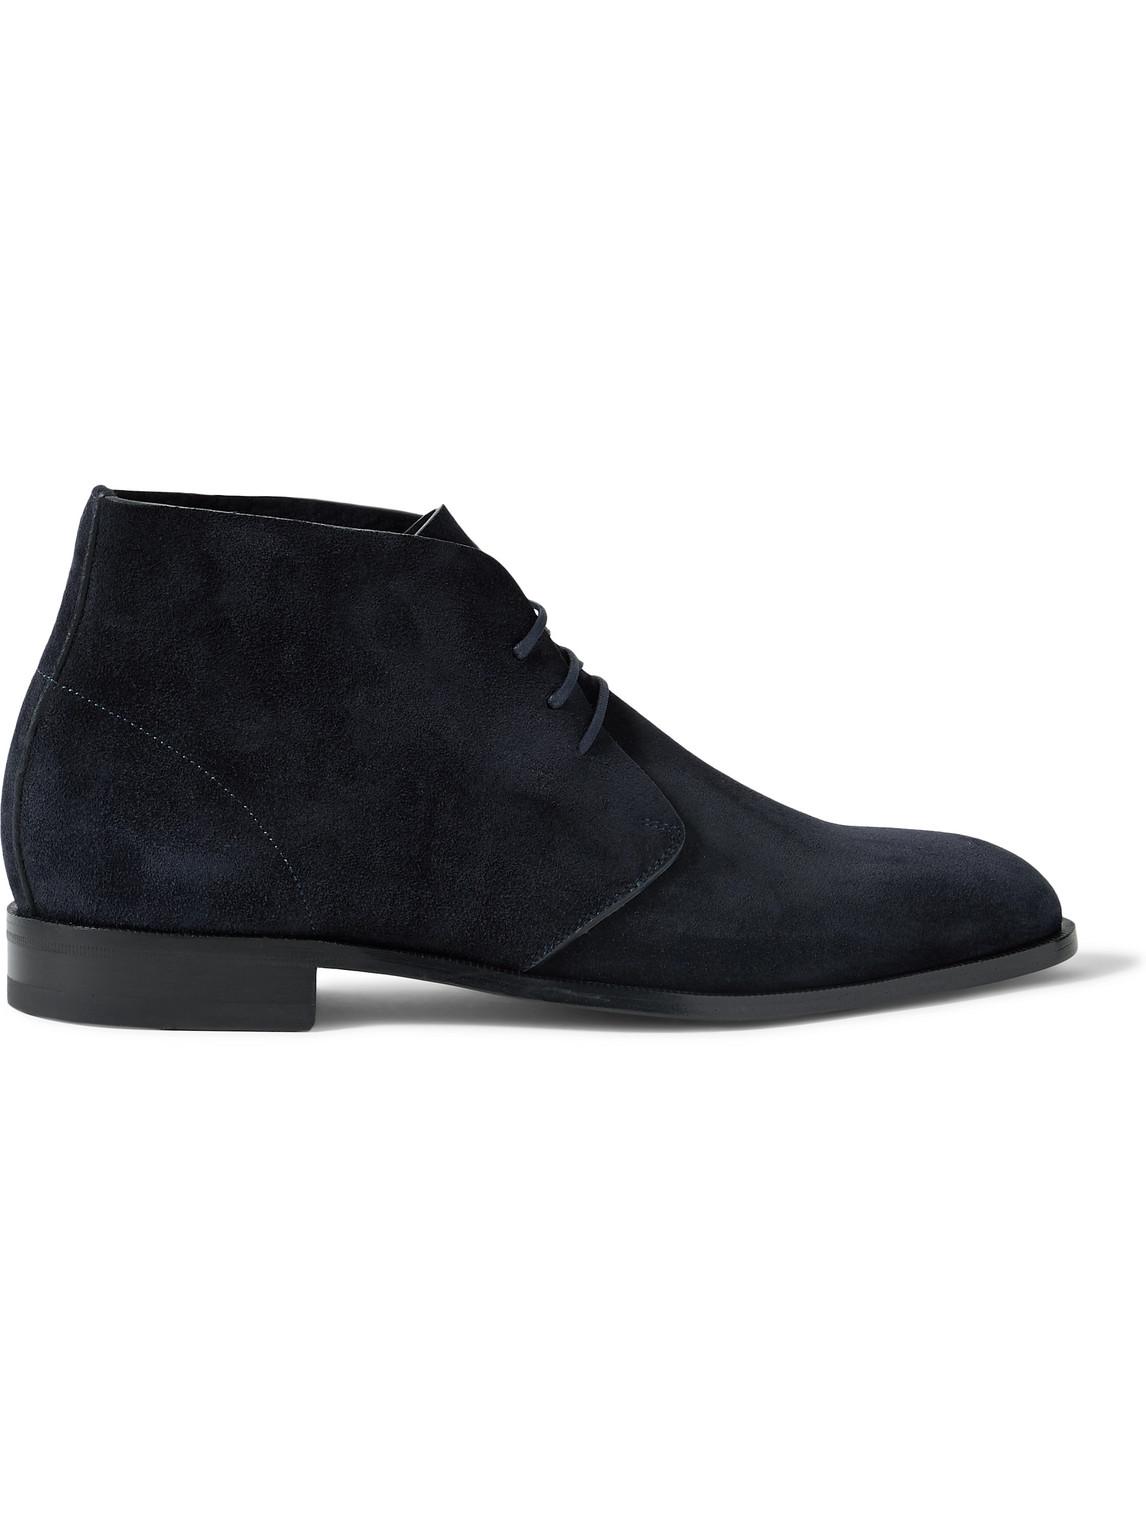 Manolo Blahnik Berwick Suede Chukka Boots In Blue